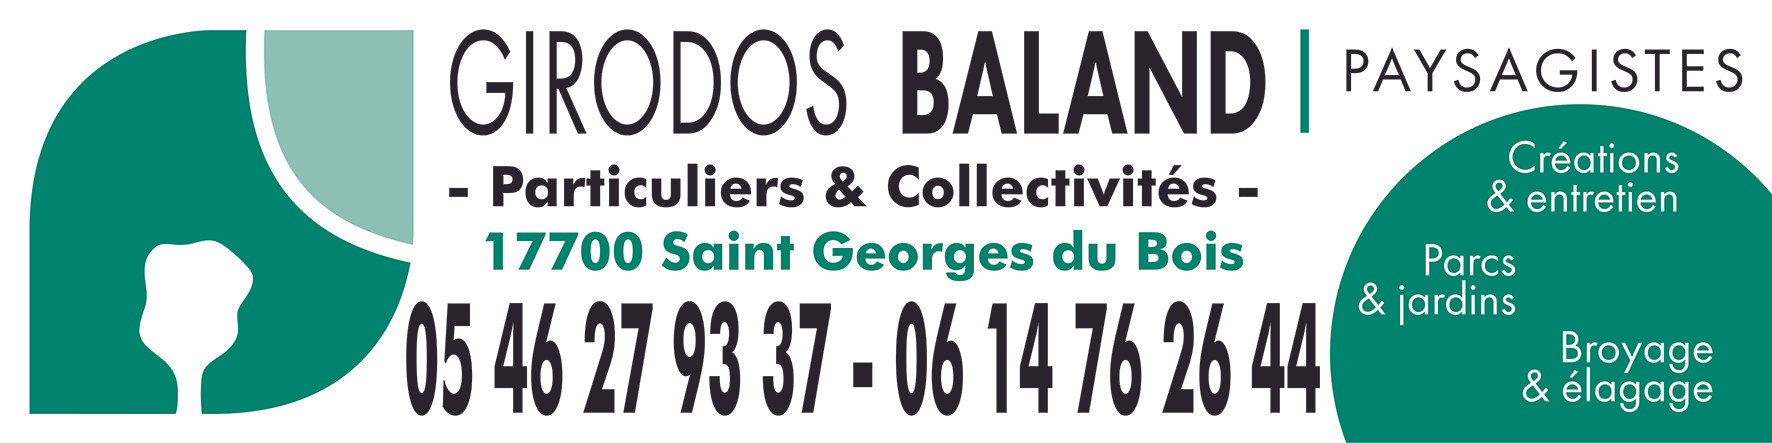 35-GirodosBaland.jpg